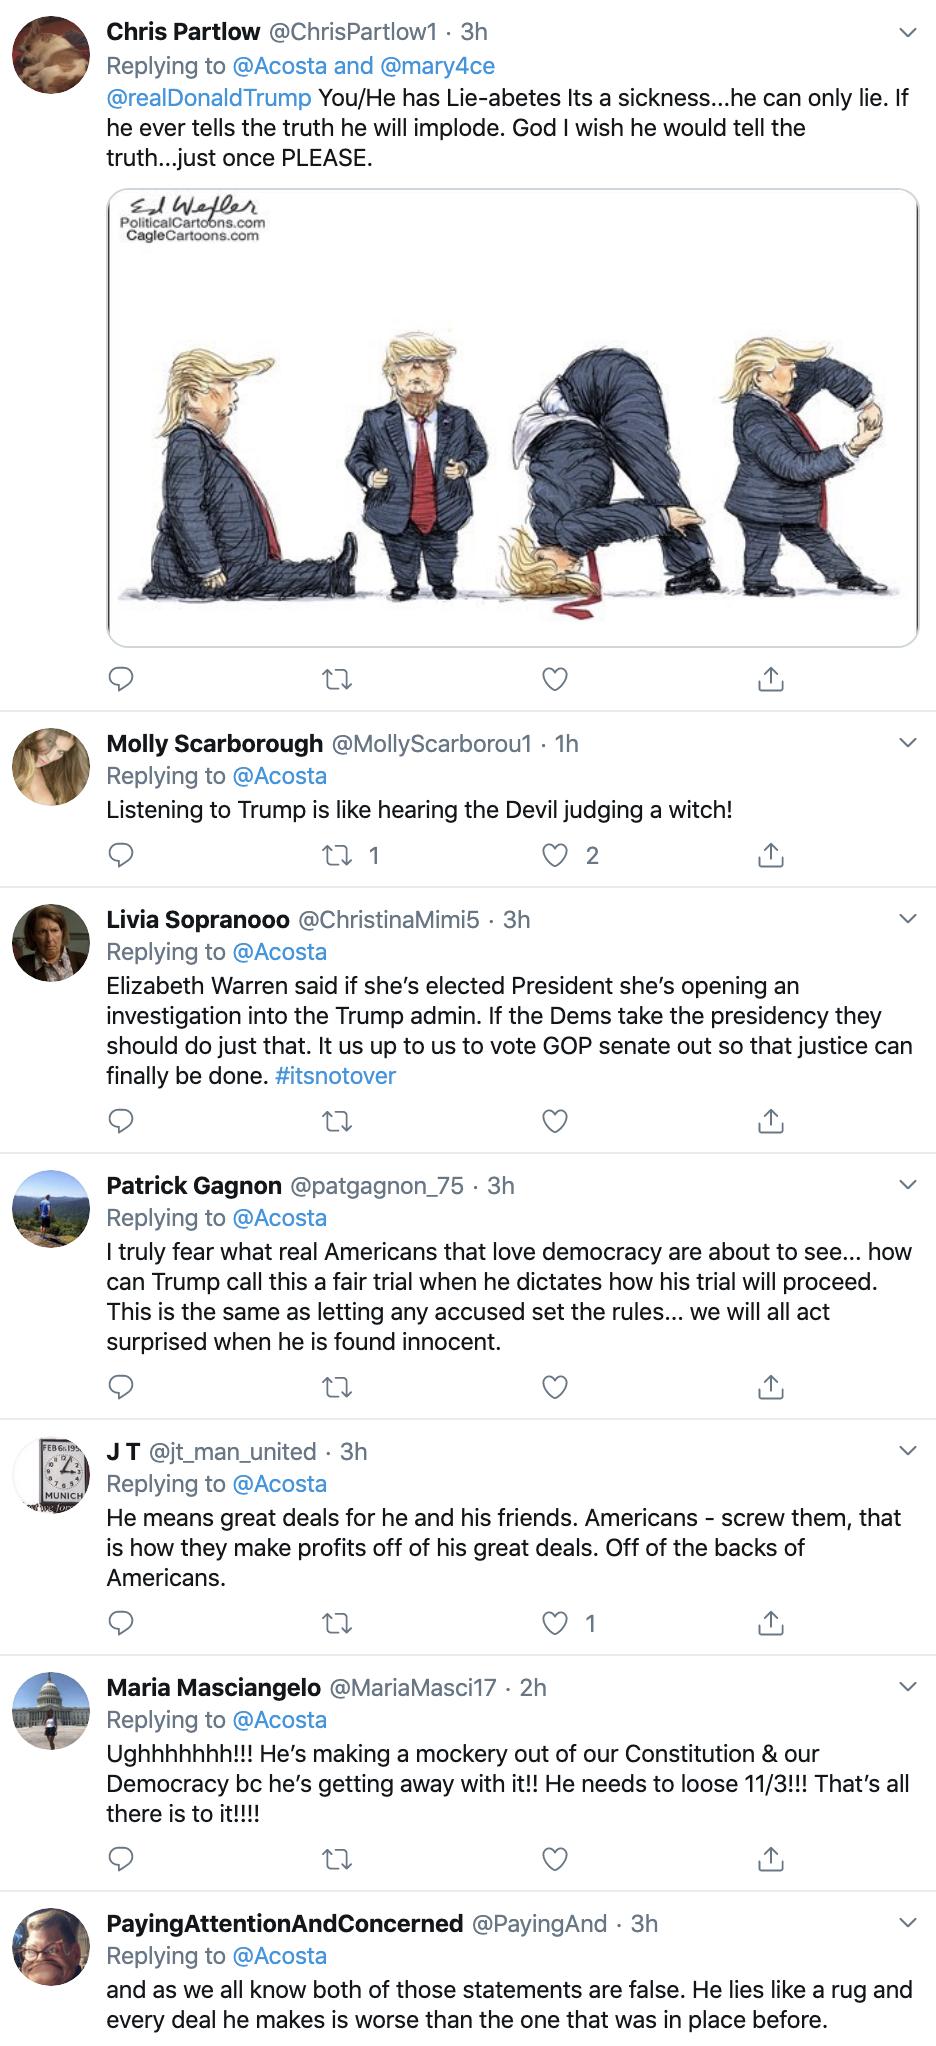 Screen-Shot-2020-01-22-at-9.31.45-AM Acosta Follows Trump In Switzerland & Publicly Trolls Him Hard Featured Impeachment Media Top Stories Twitter